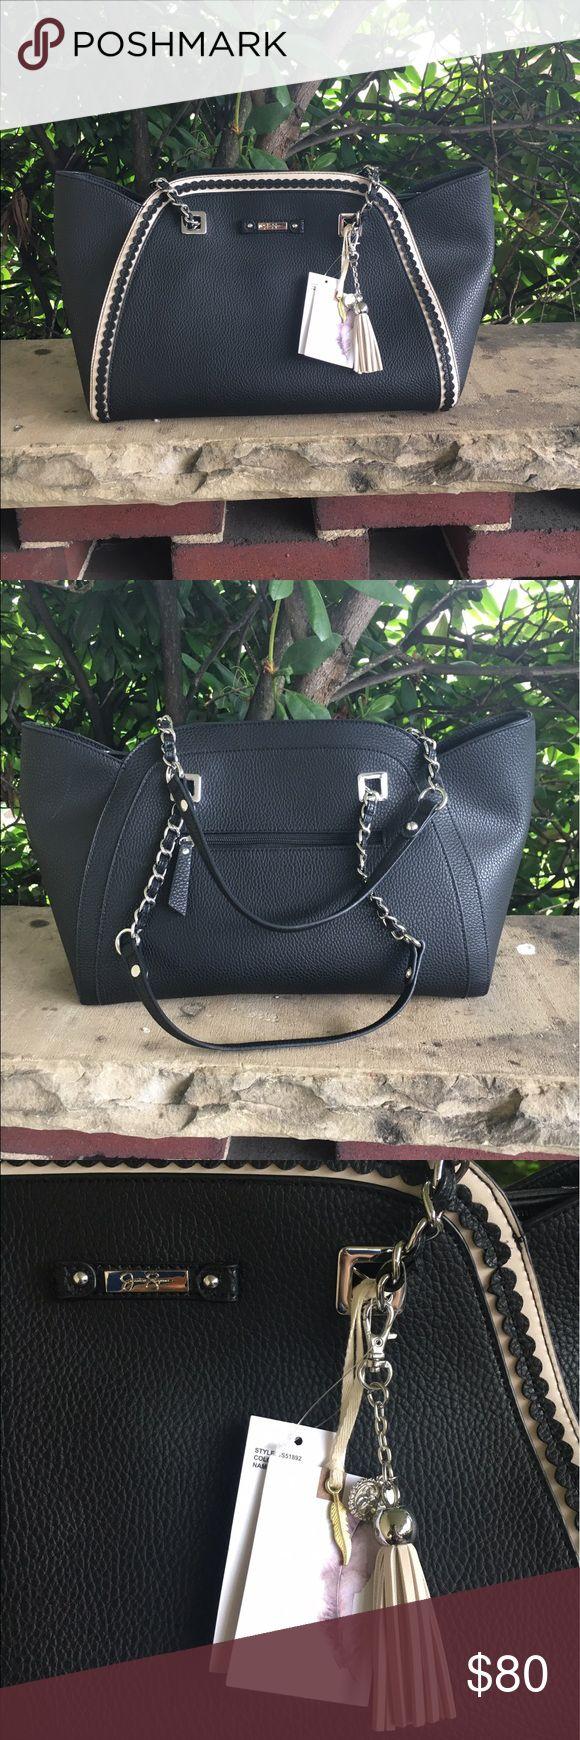 Jessica Simpson Winnie tote New black Jessica Simpson purse Jessica Simpson Bags Shoulder Bags